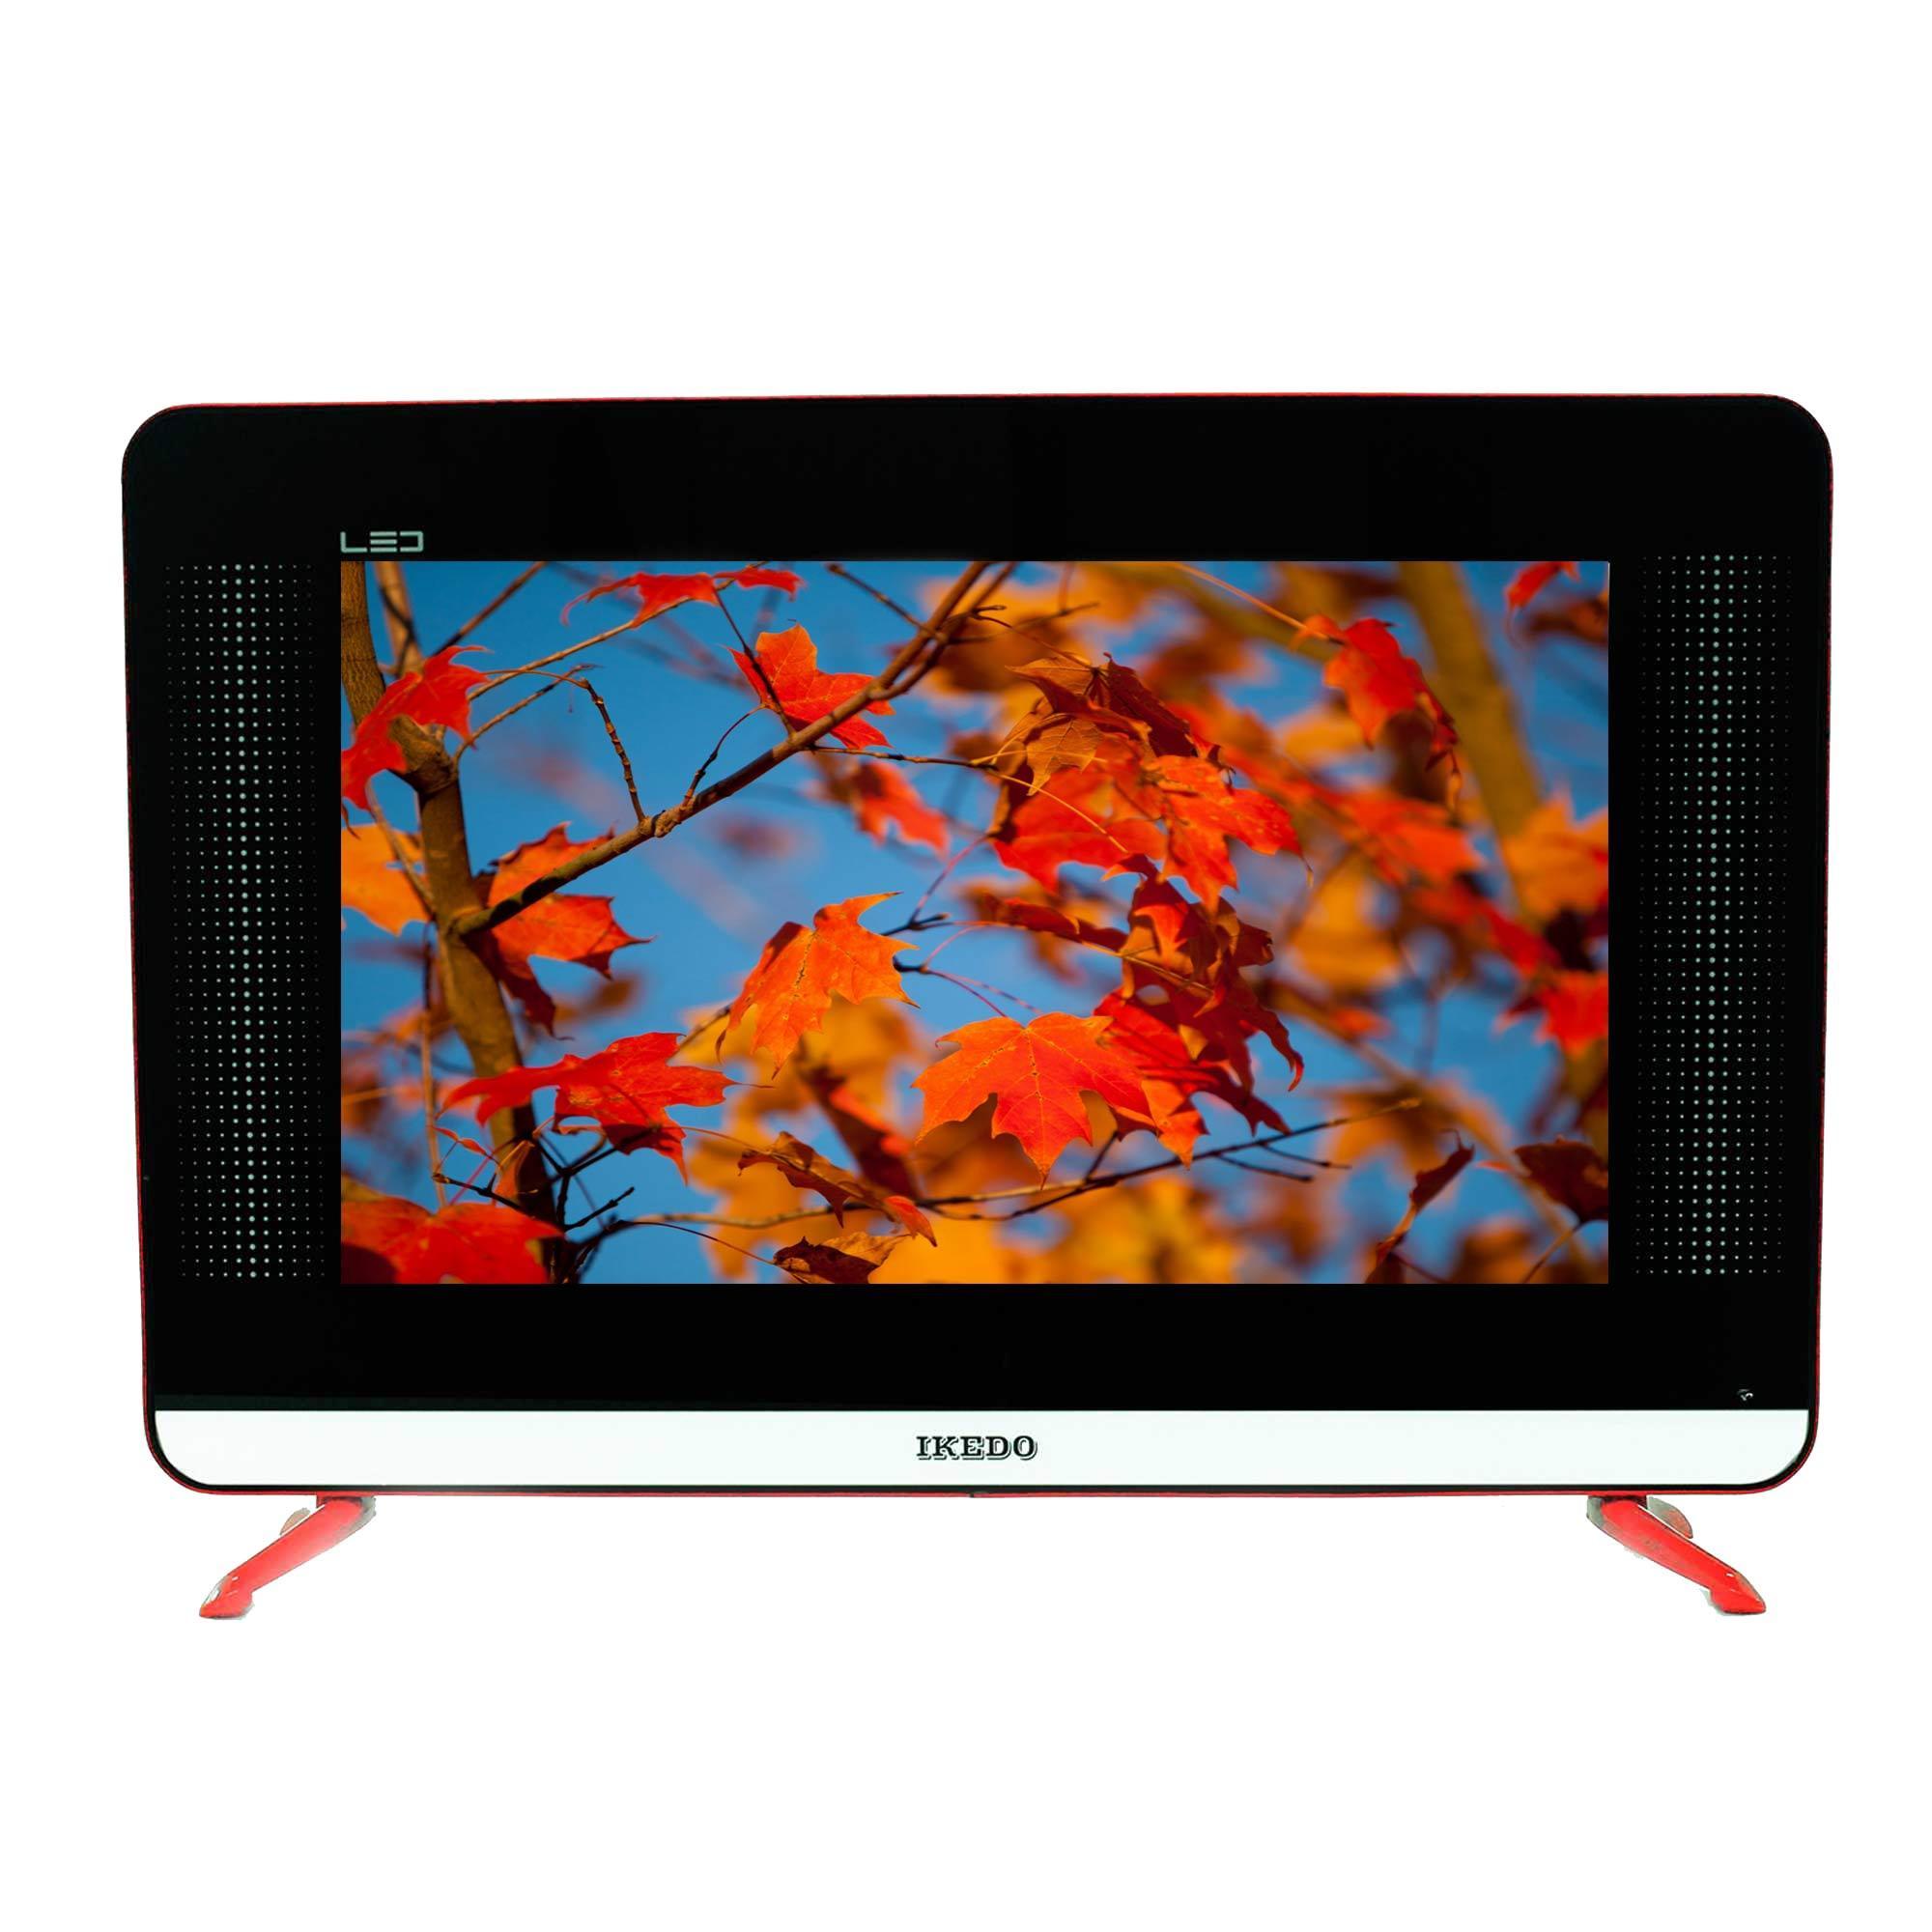 IKEDO LED TV 21 WIDE - LT21P1U FULL HD TERBARU